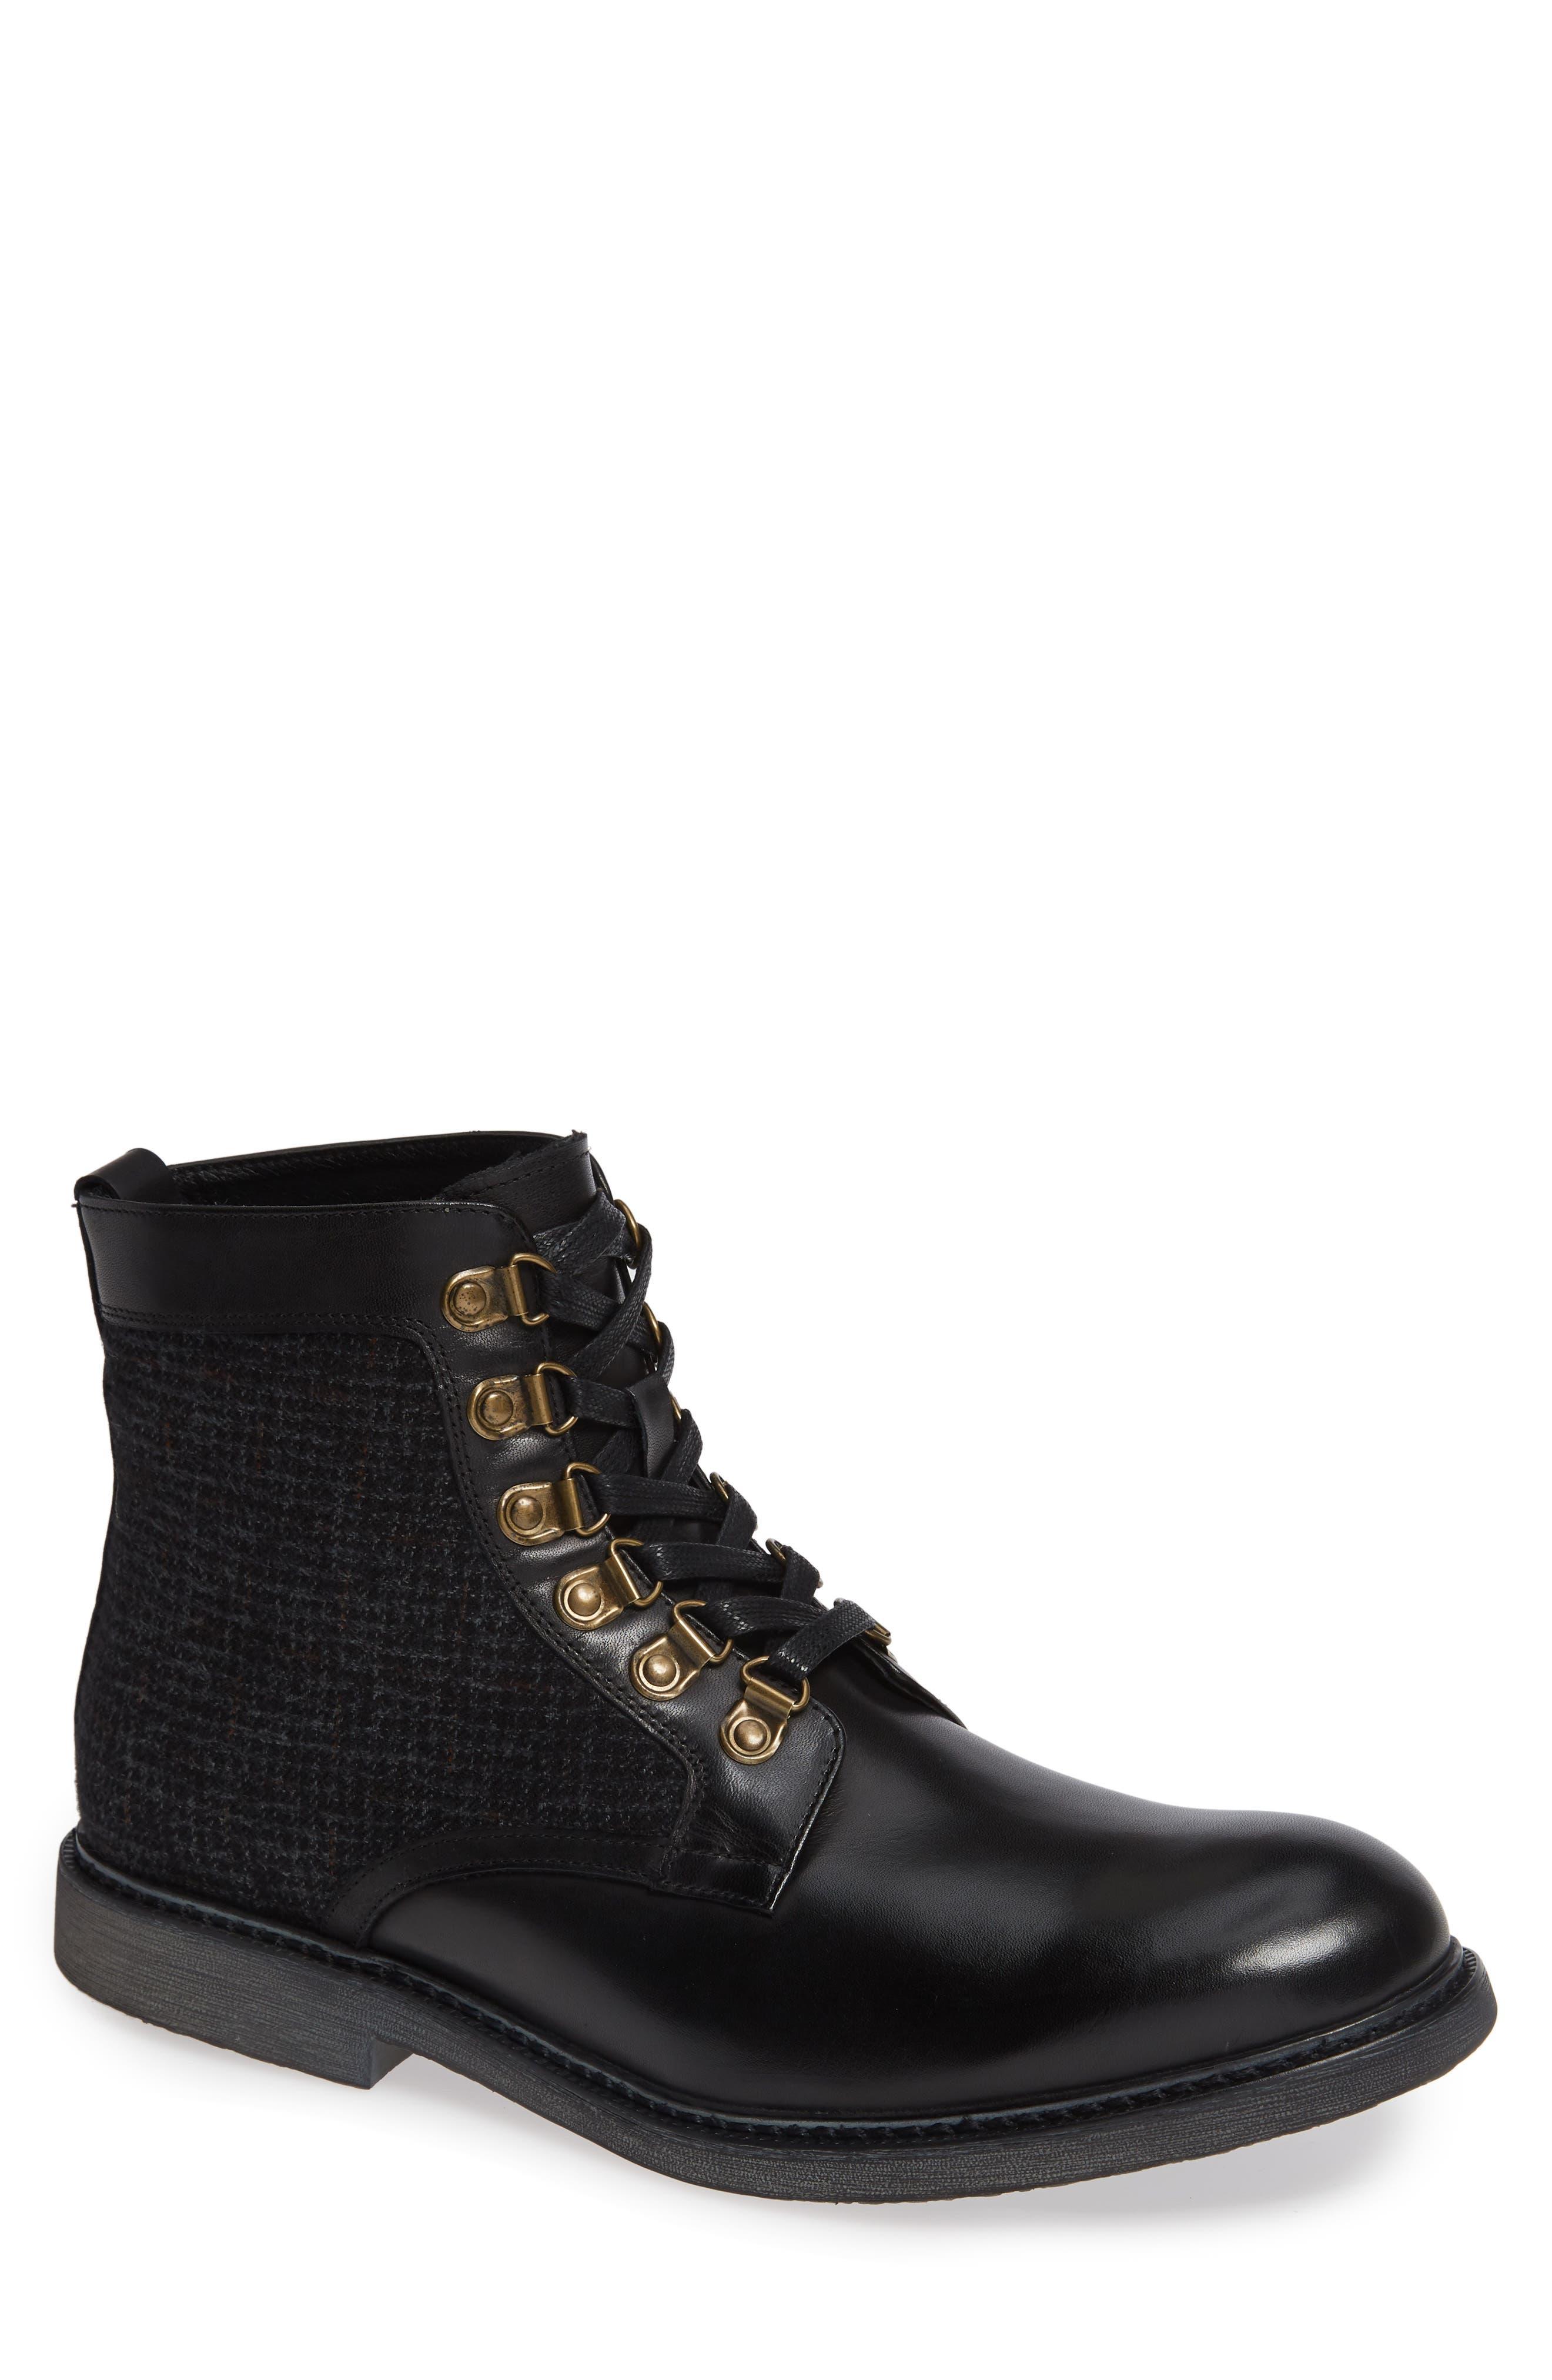 Bradford Textured Suede Boot,                         Main,                         color, BLACK